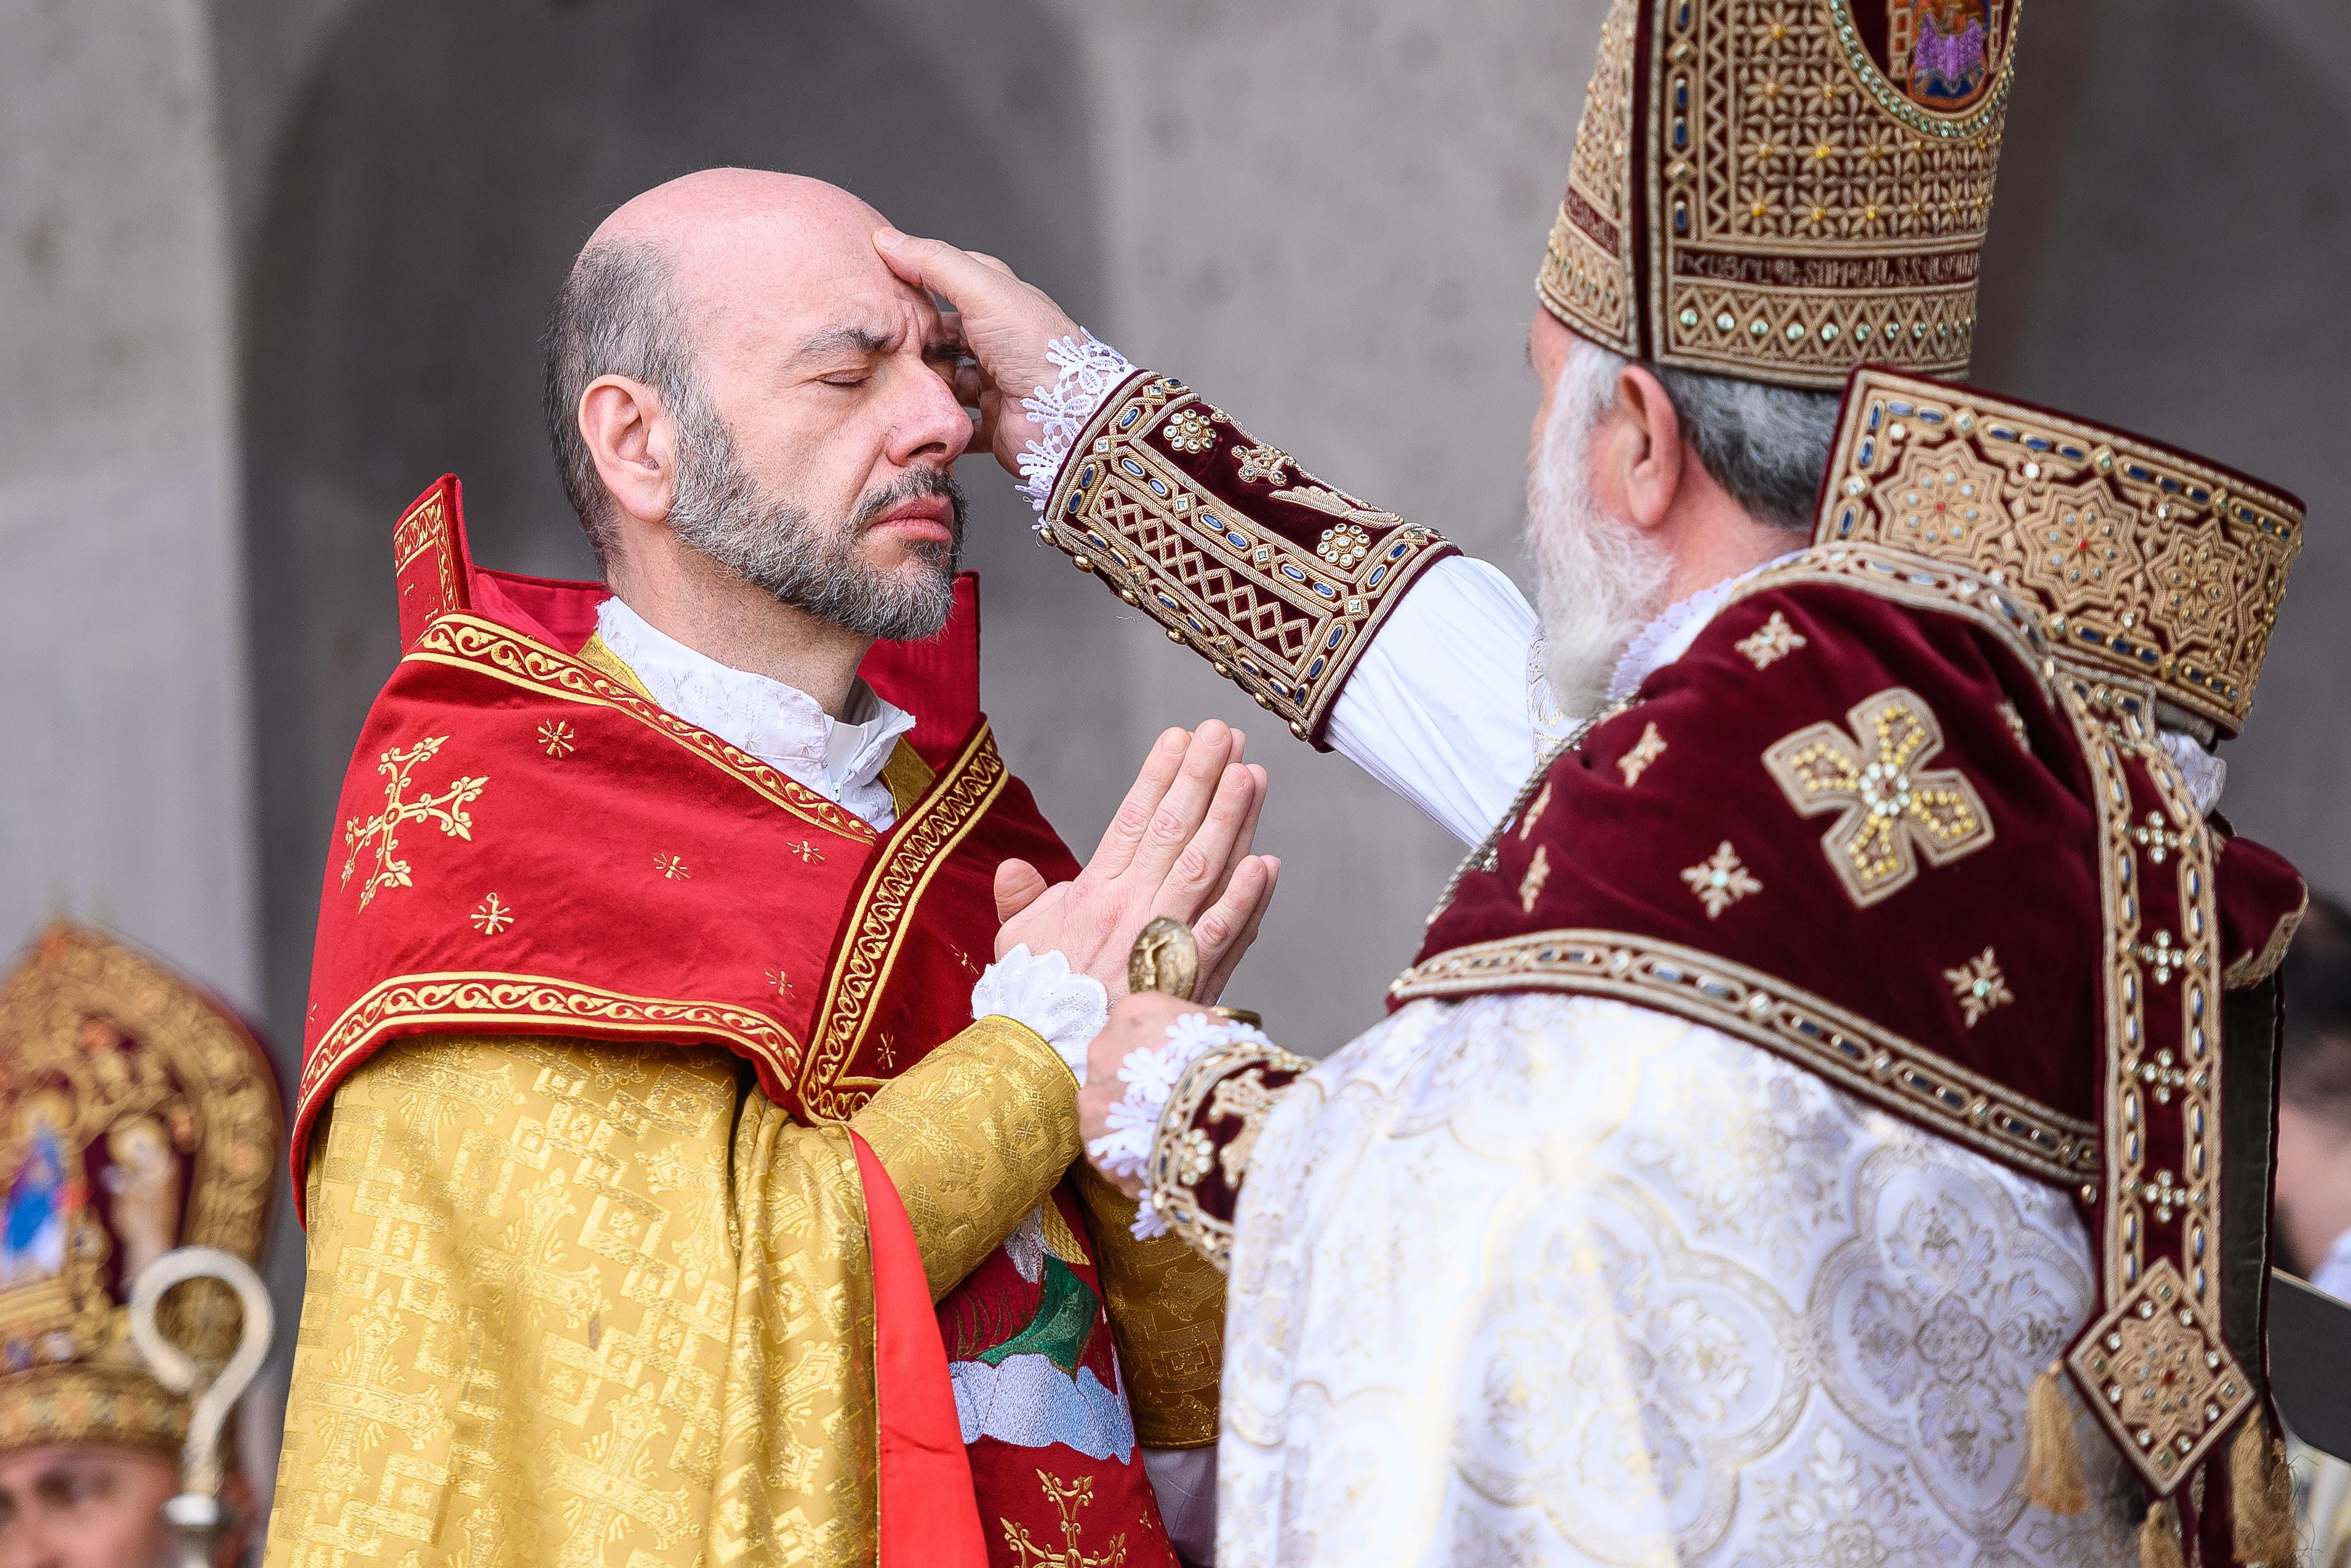 BDF episcopal ordination, consecration